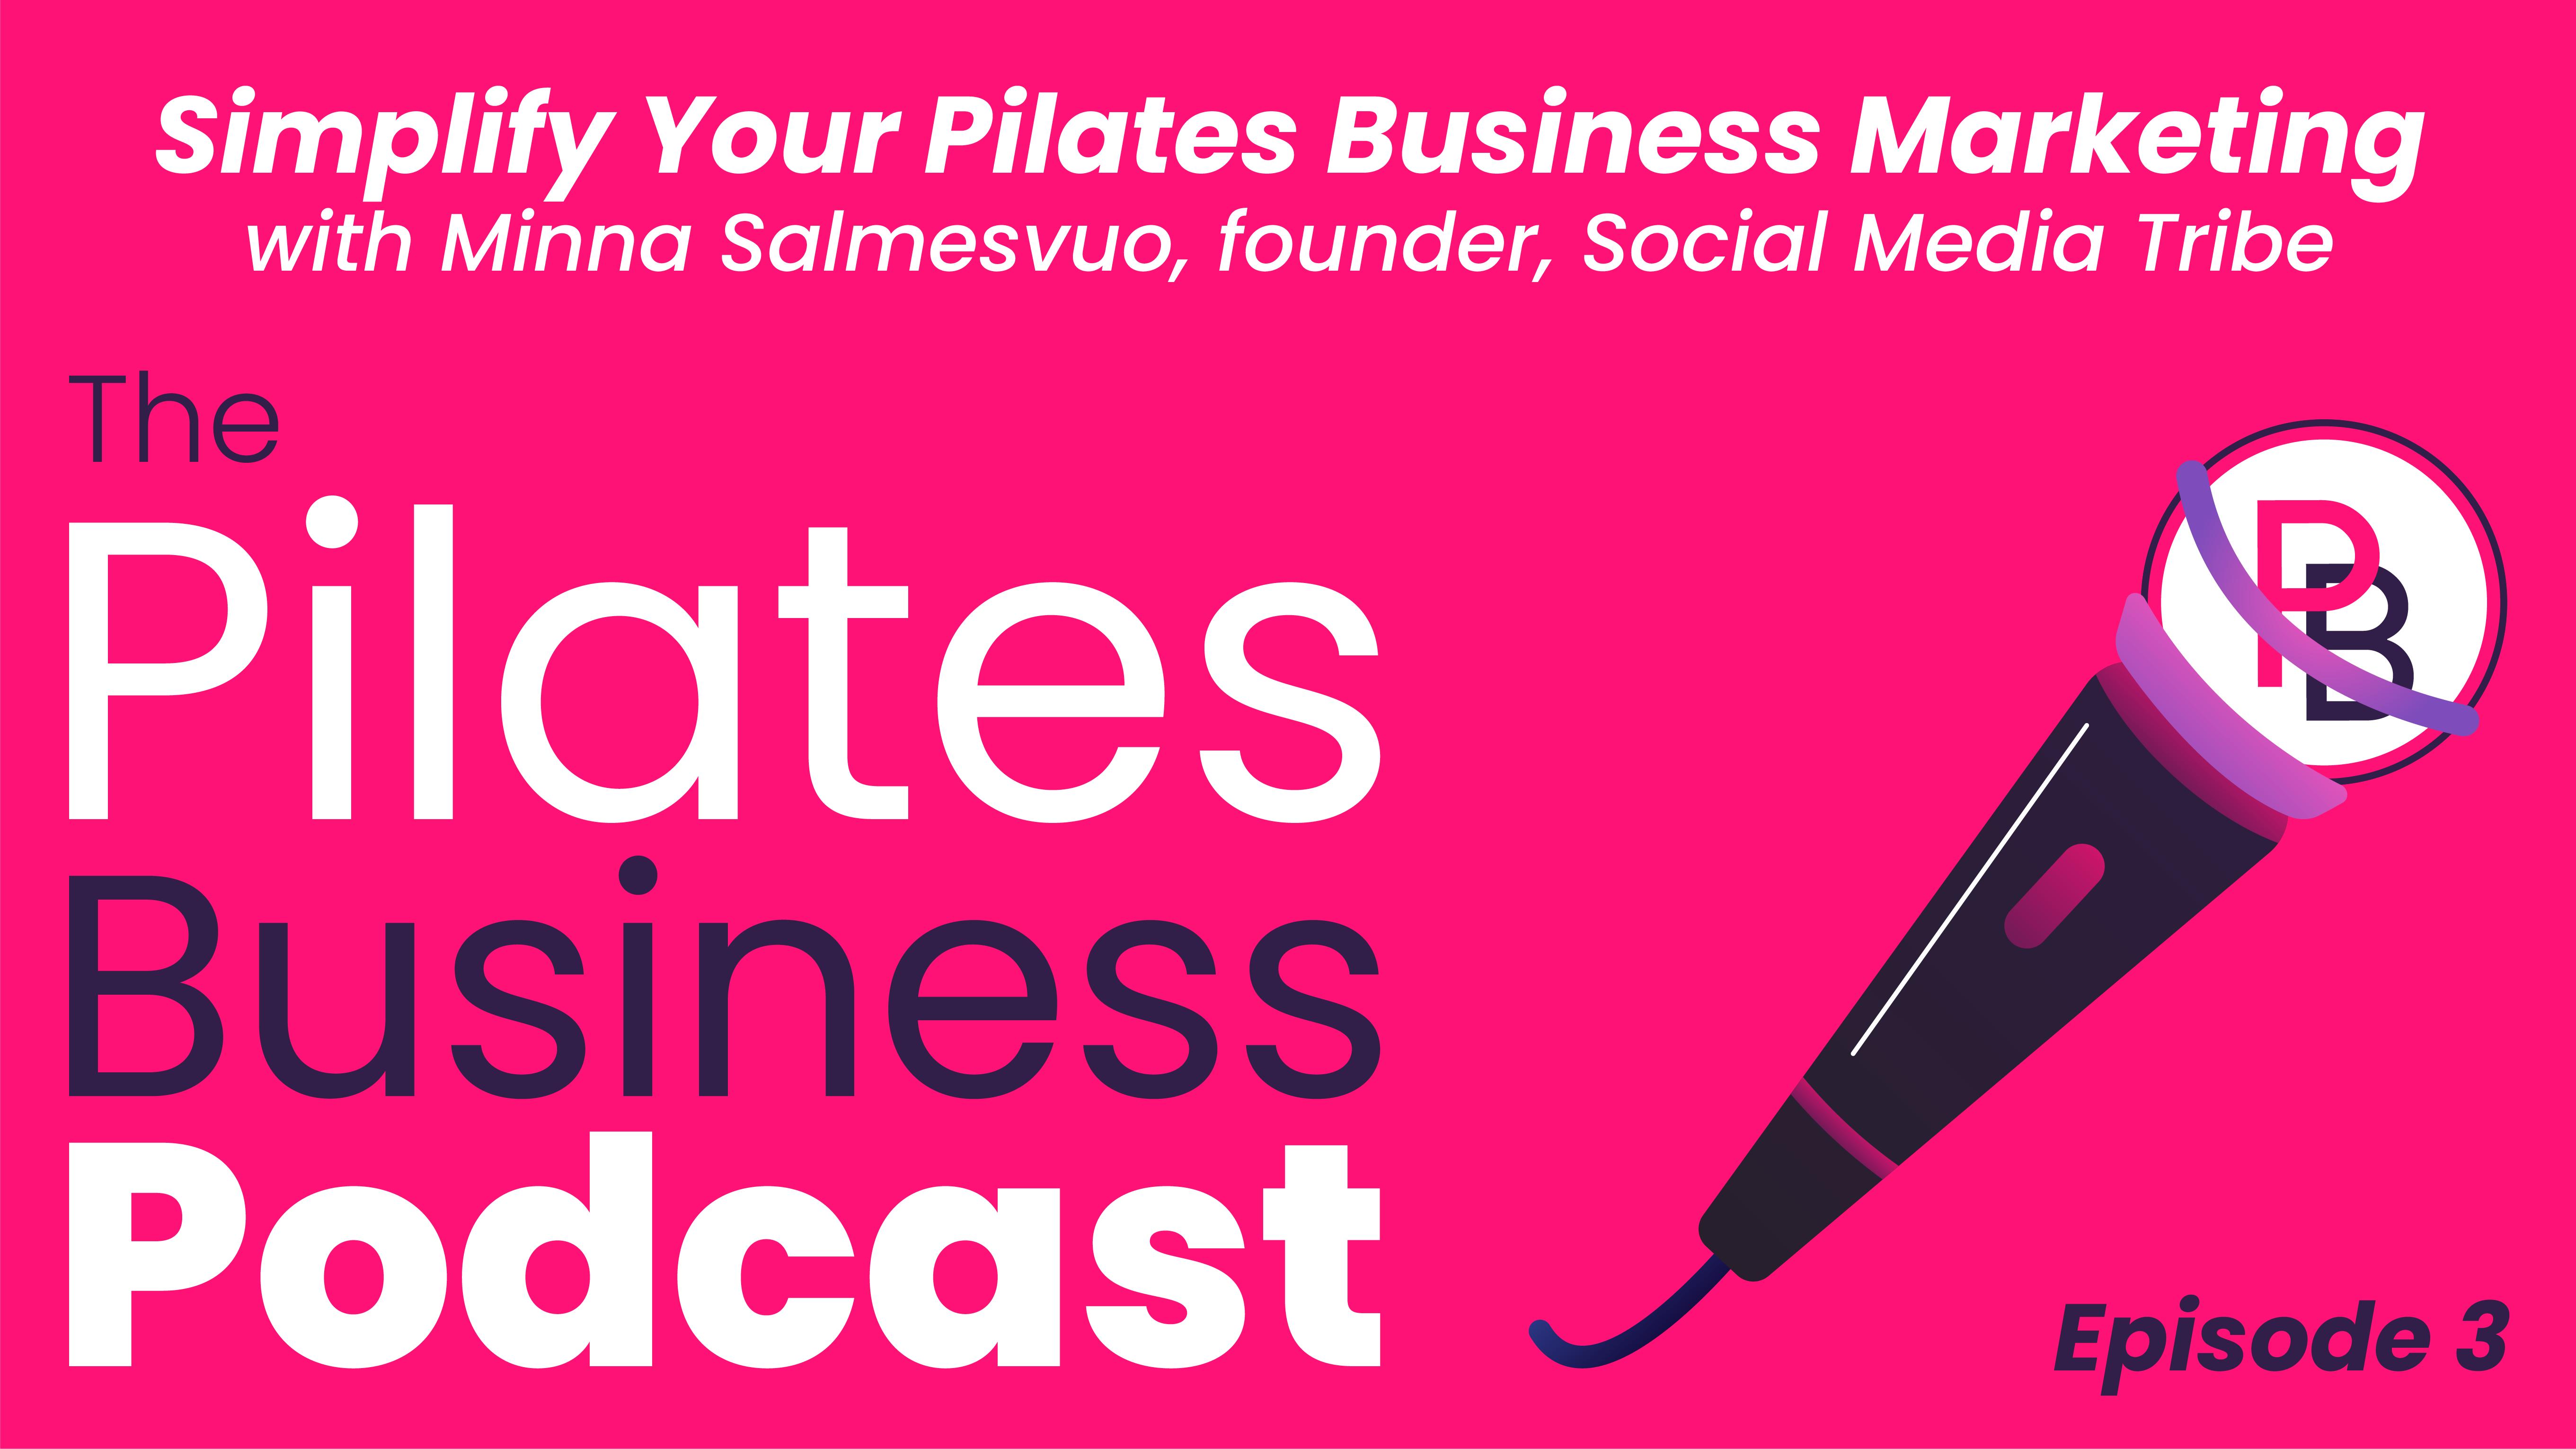 pilates business marketing with minna